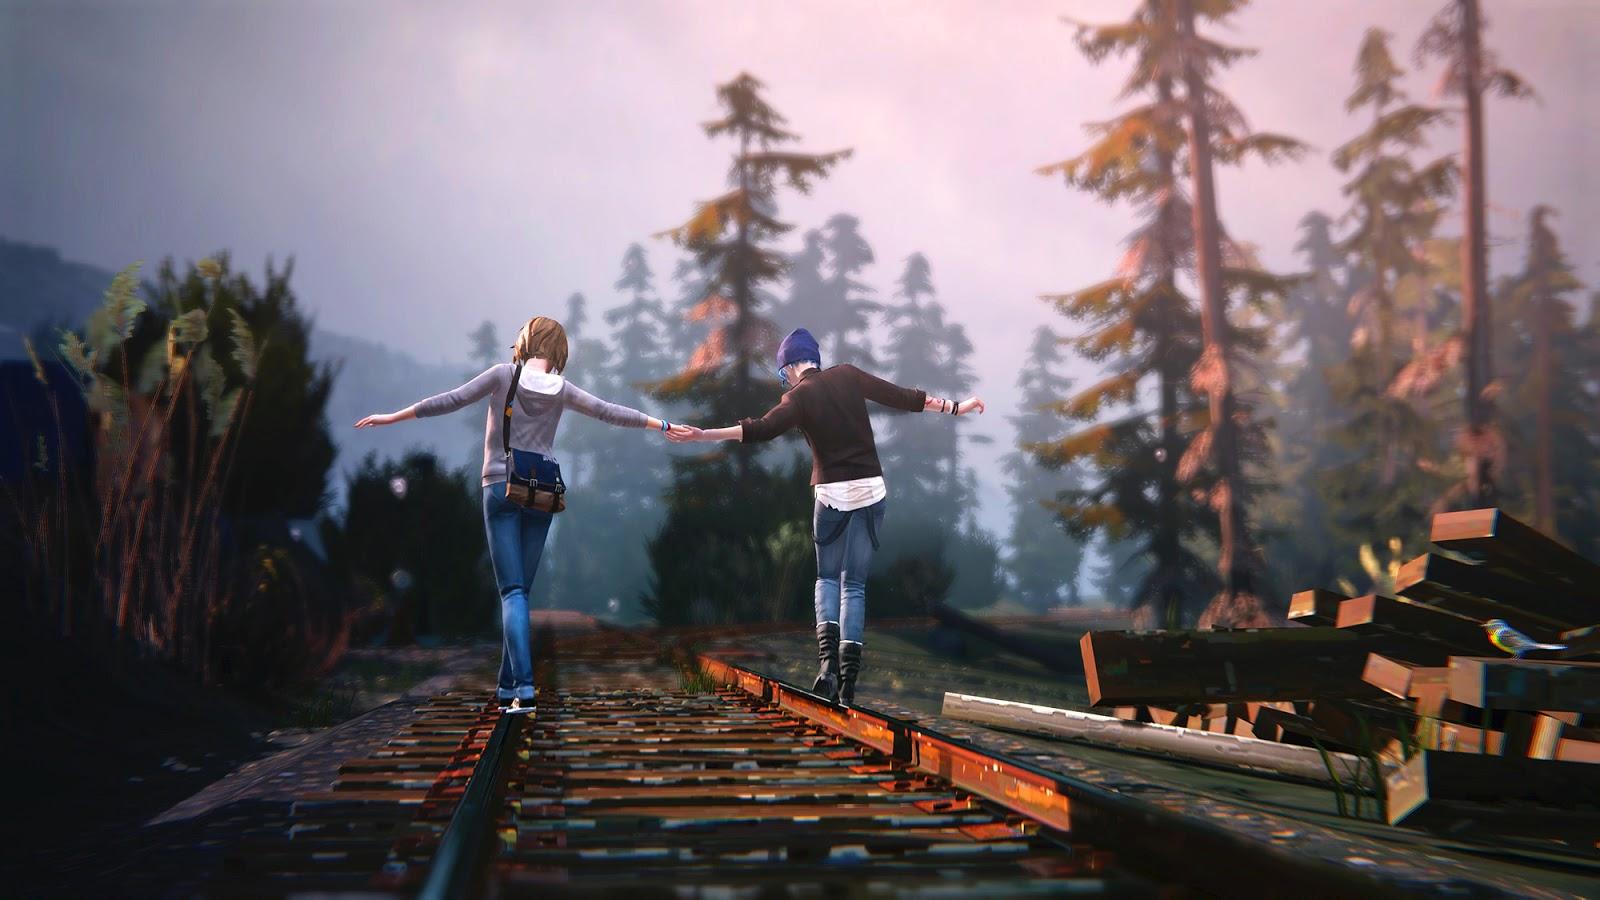 life is strange review, life is strange ps4 review, girly gaming, life is strange game review, games for girls, girl games